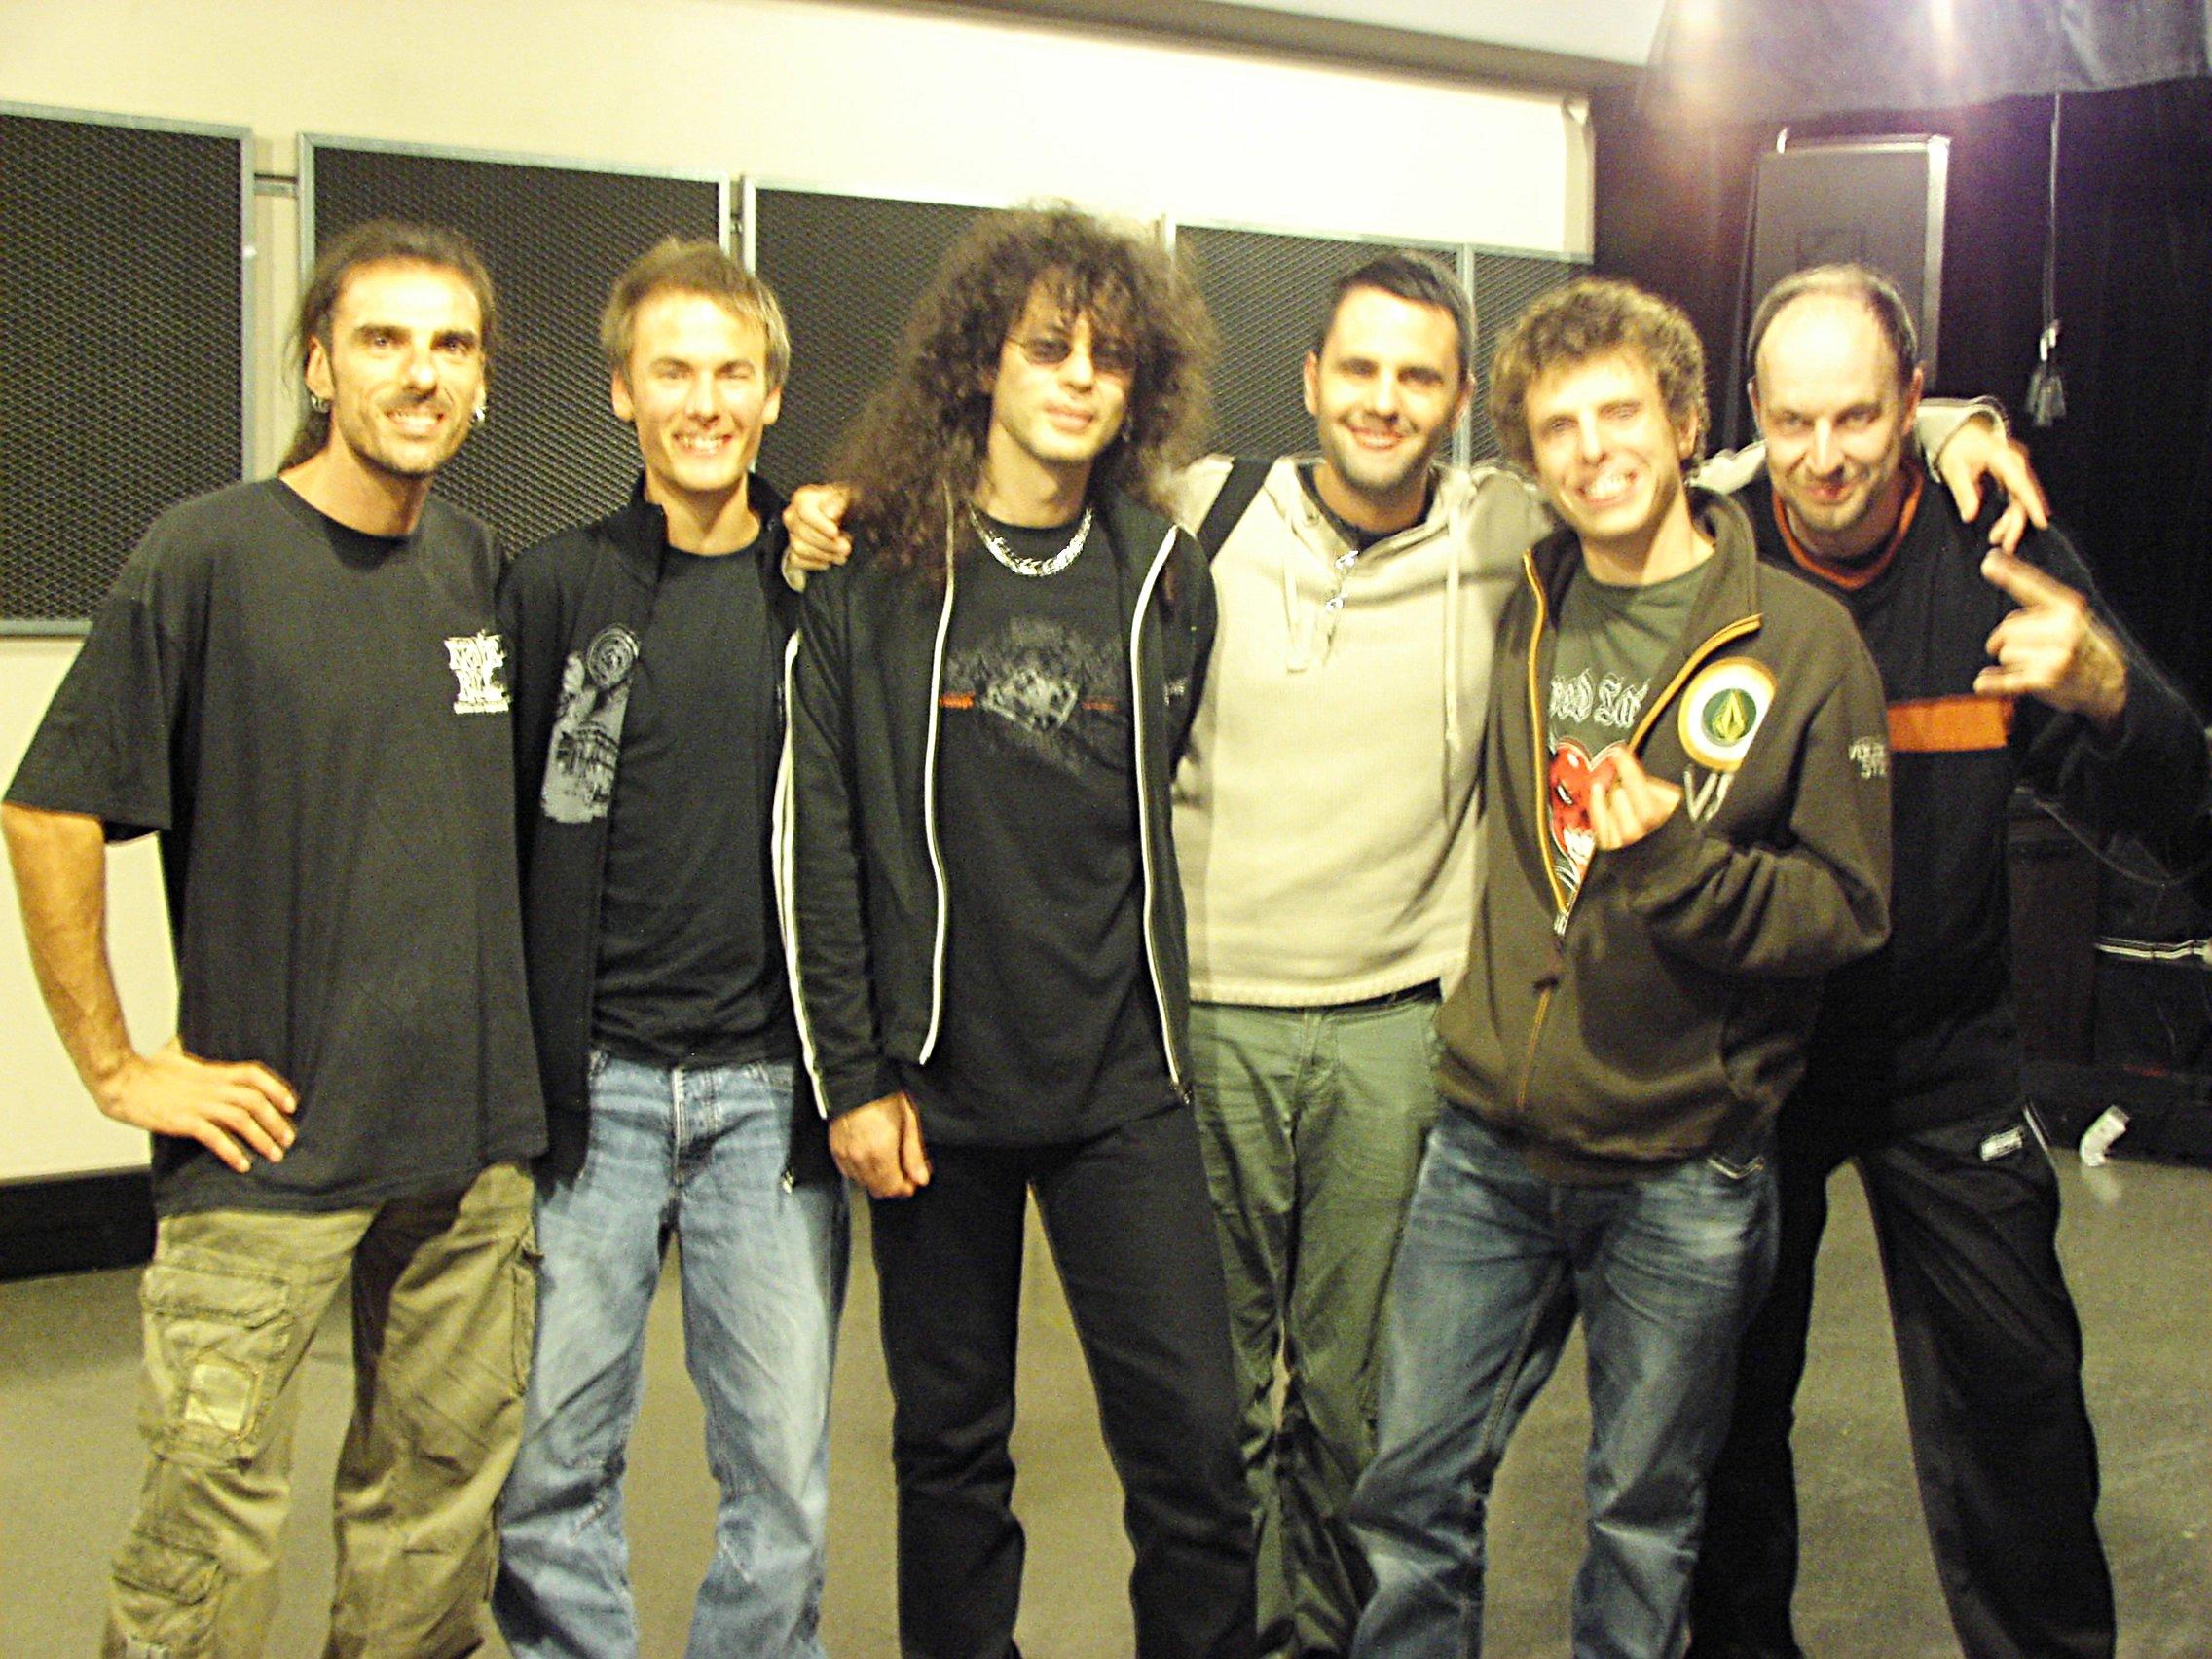 Rondat, Guers, Martin, Bruinenberg, Remy et moi